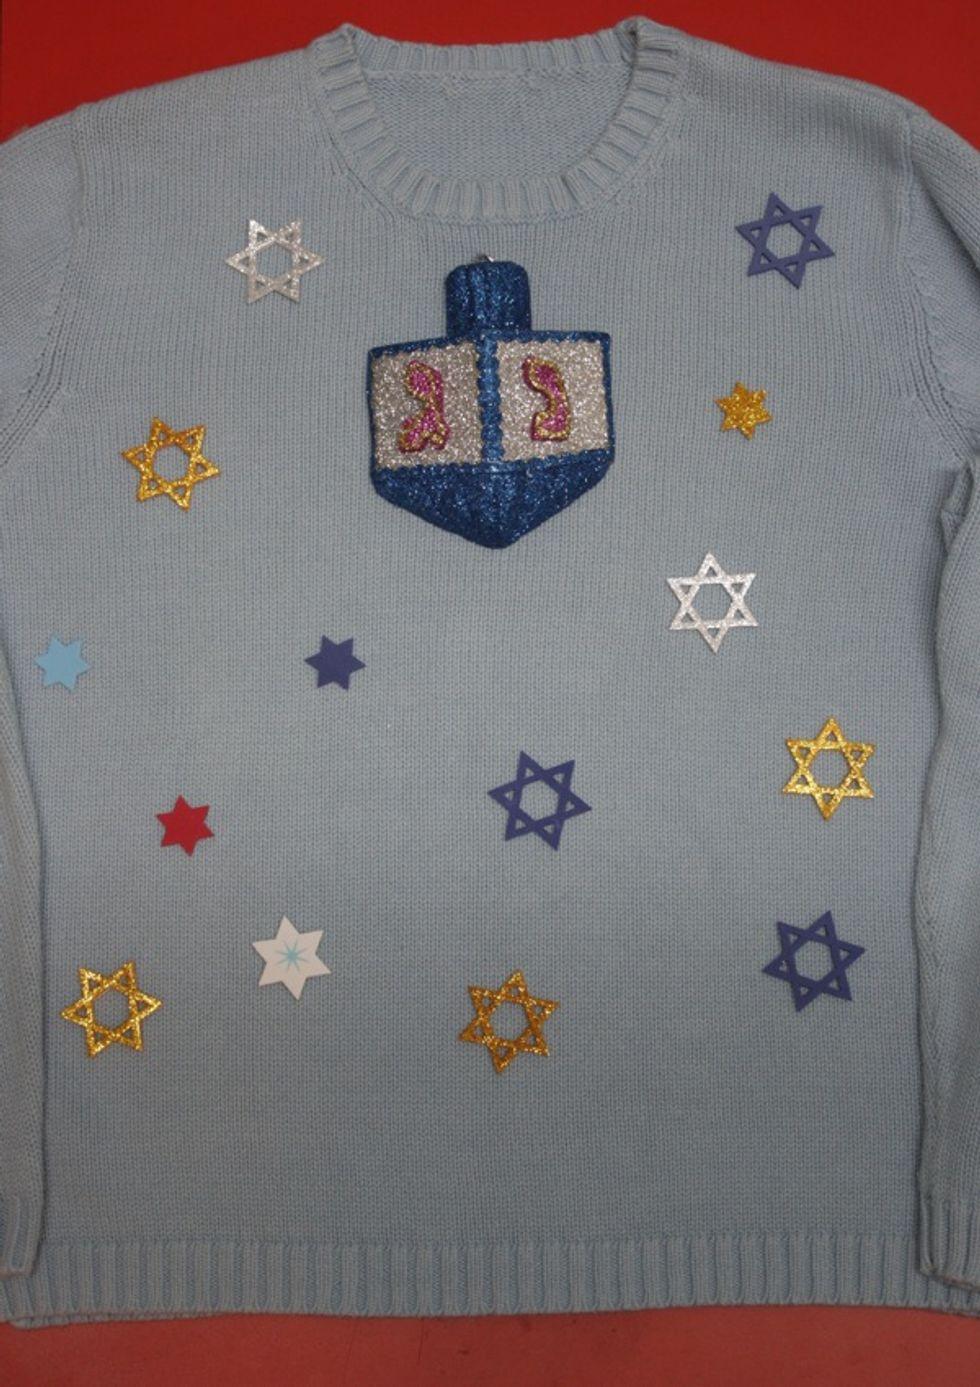 Screaming Mimi's Is Now Selling Ugly Hanukkah Sweaters